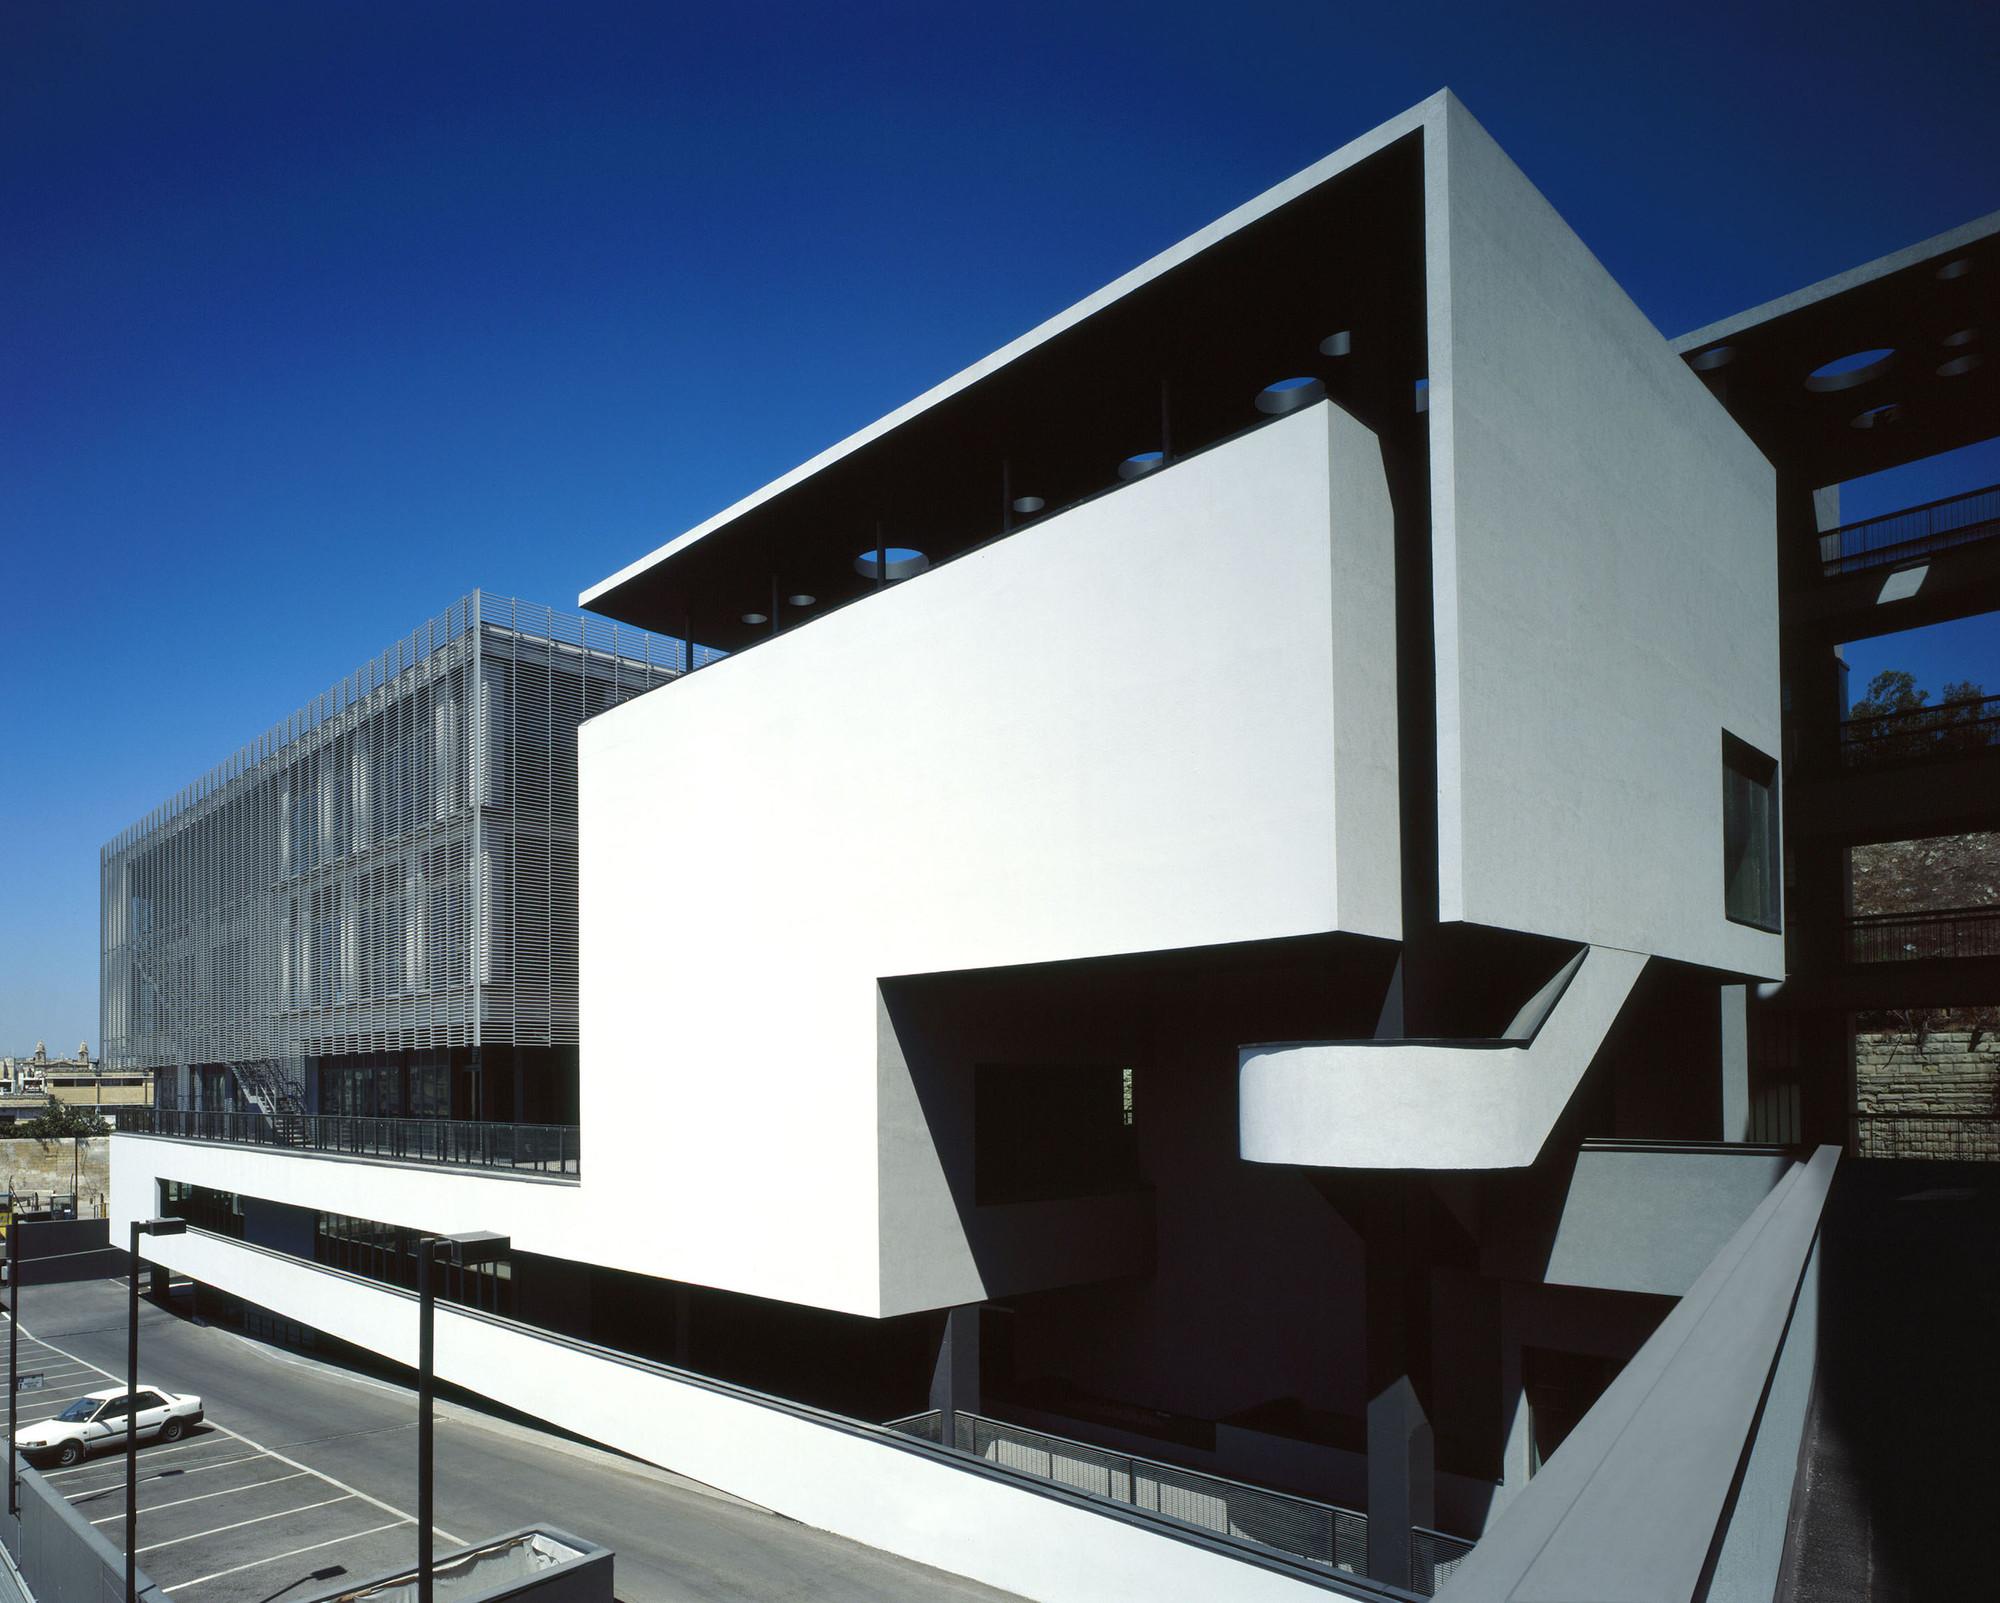 Centro de Comércio Malta Maritime / Architecture Project, © David Pisani